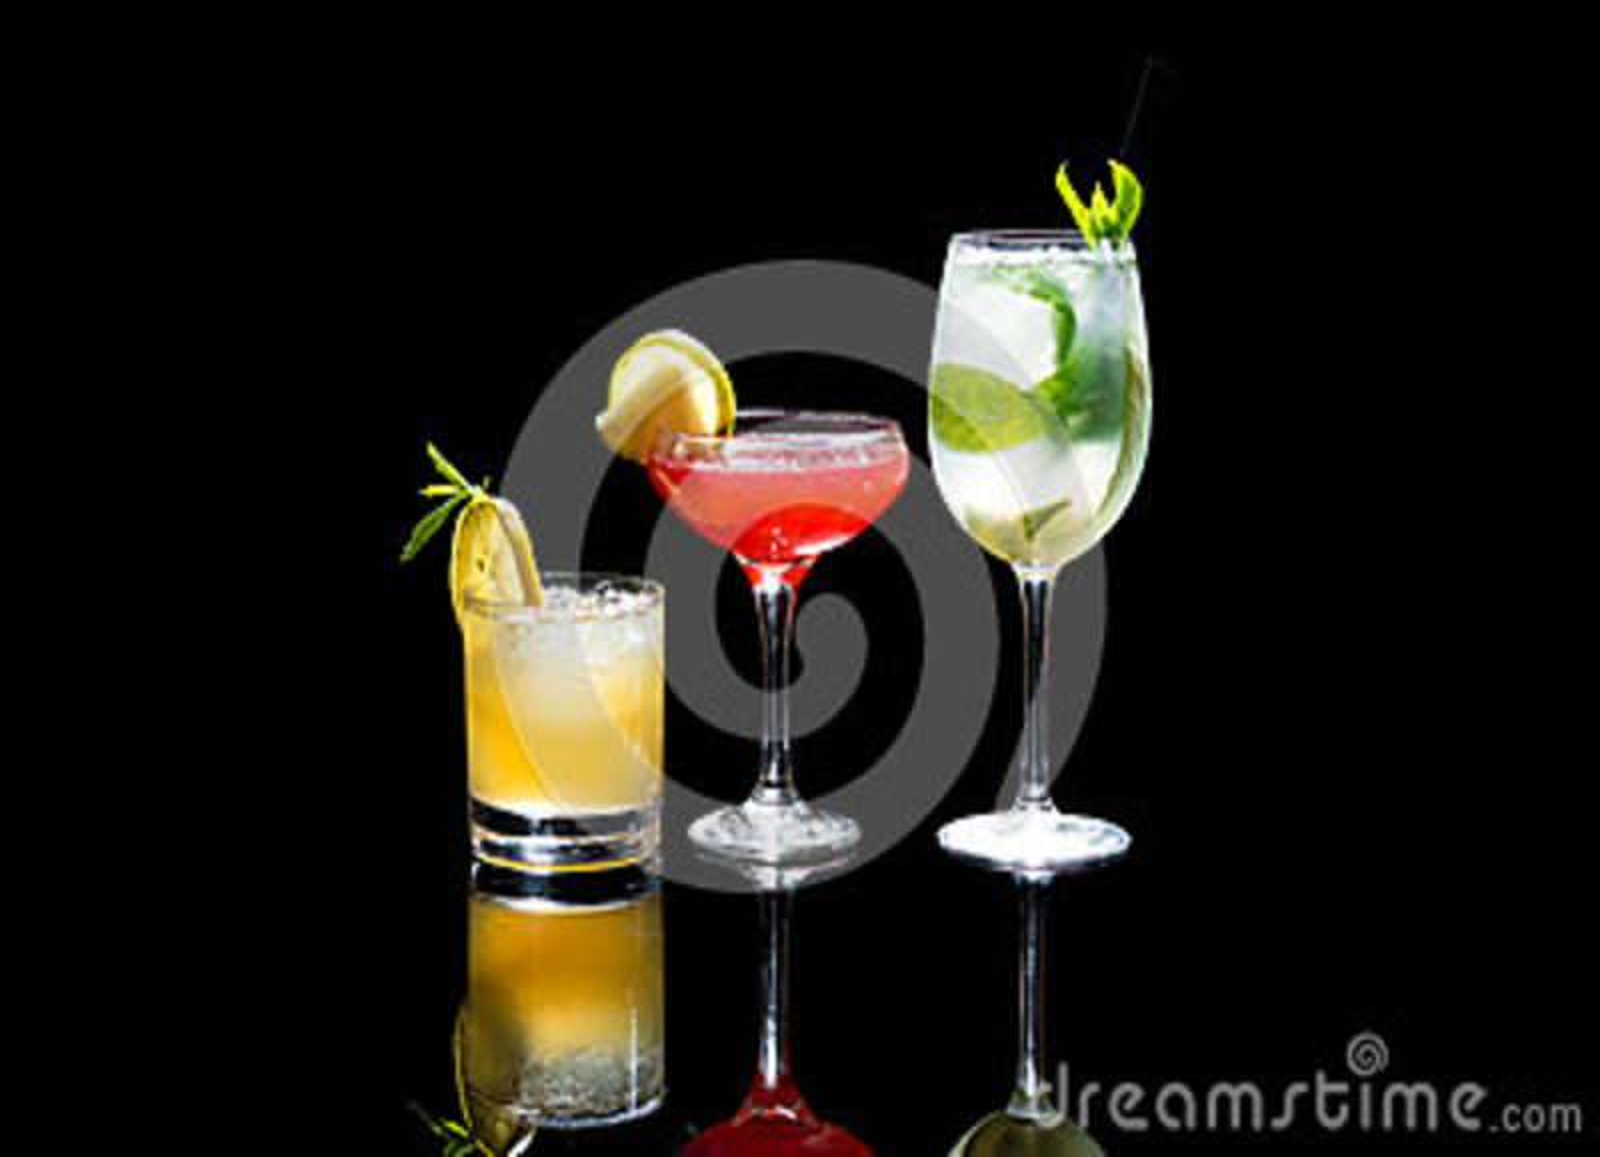 Christmas Drinks Alcohol.Cocktails Stock Image Image Of Liquor Alcohol Lime 79008309